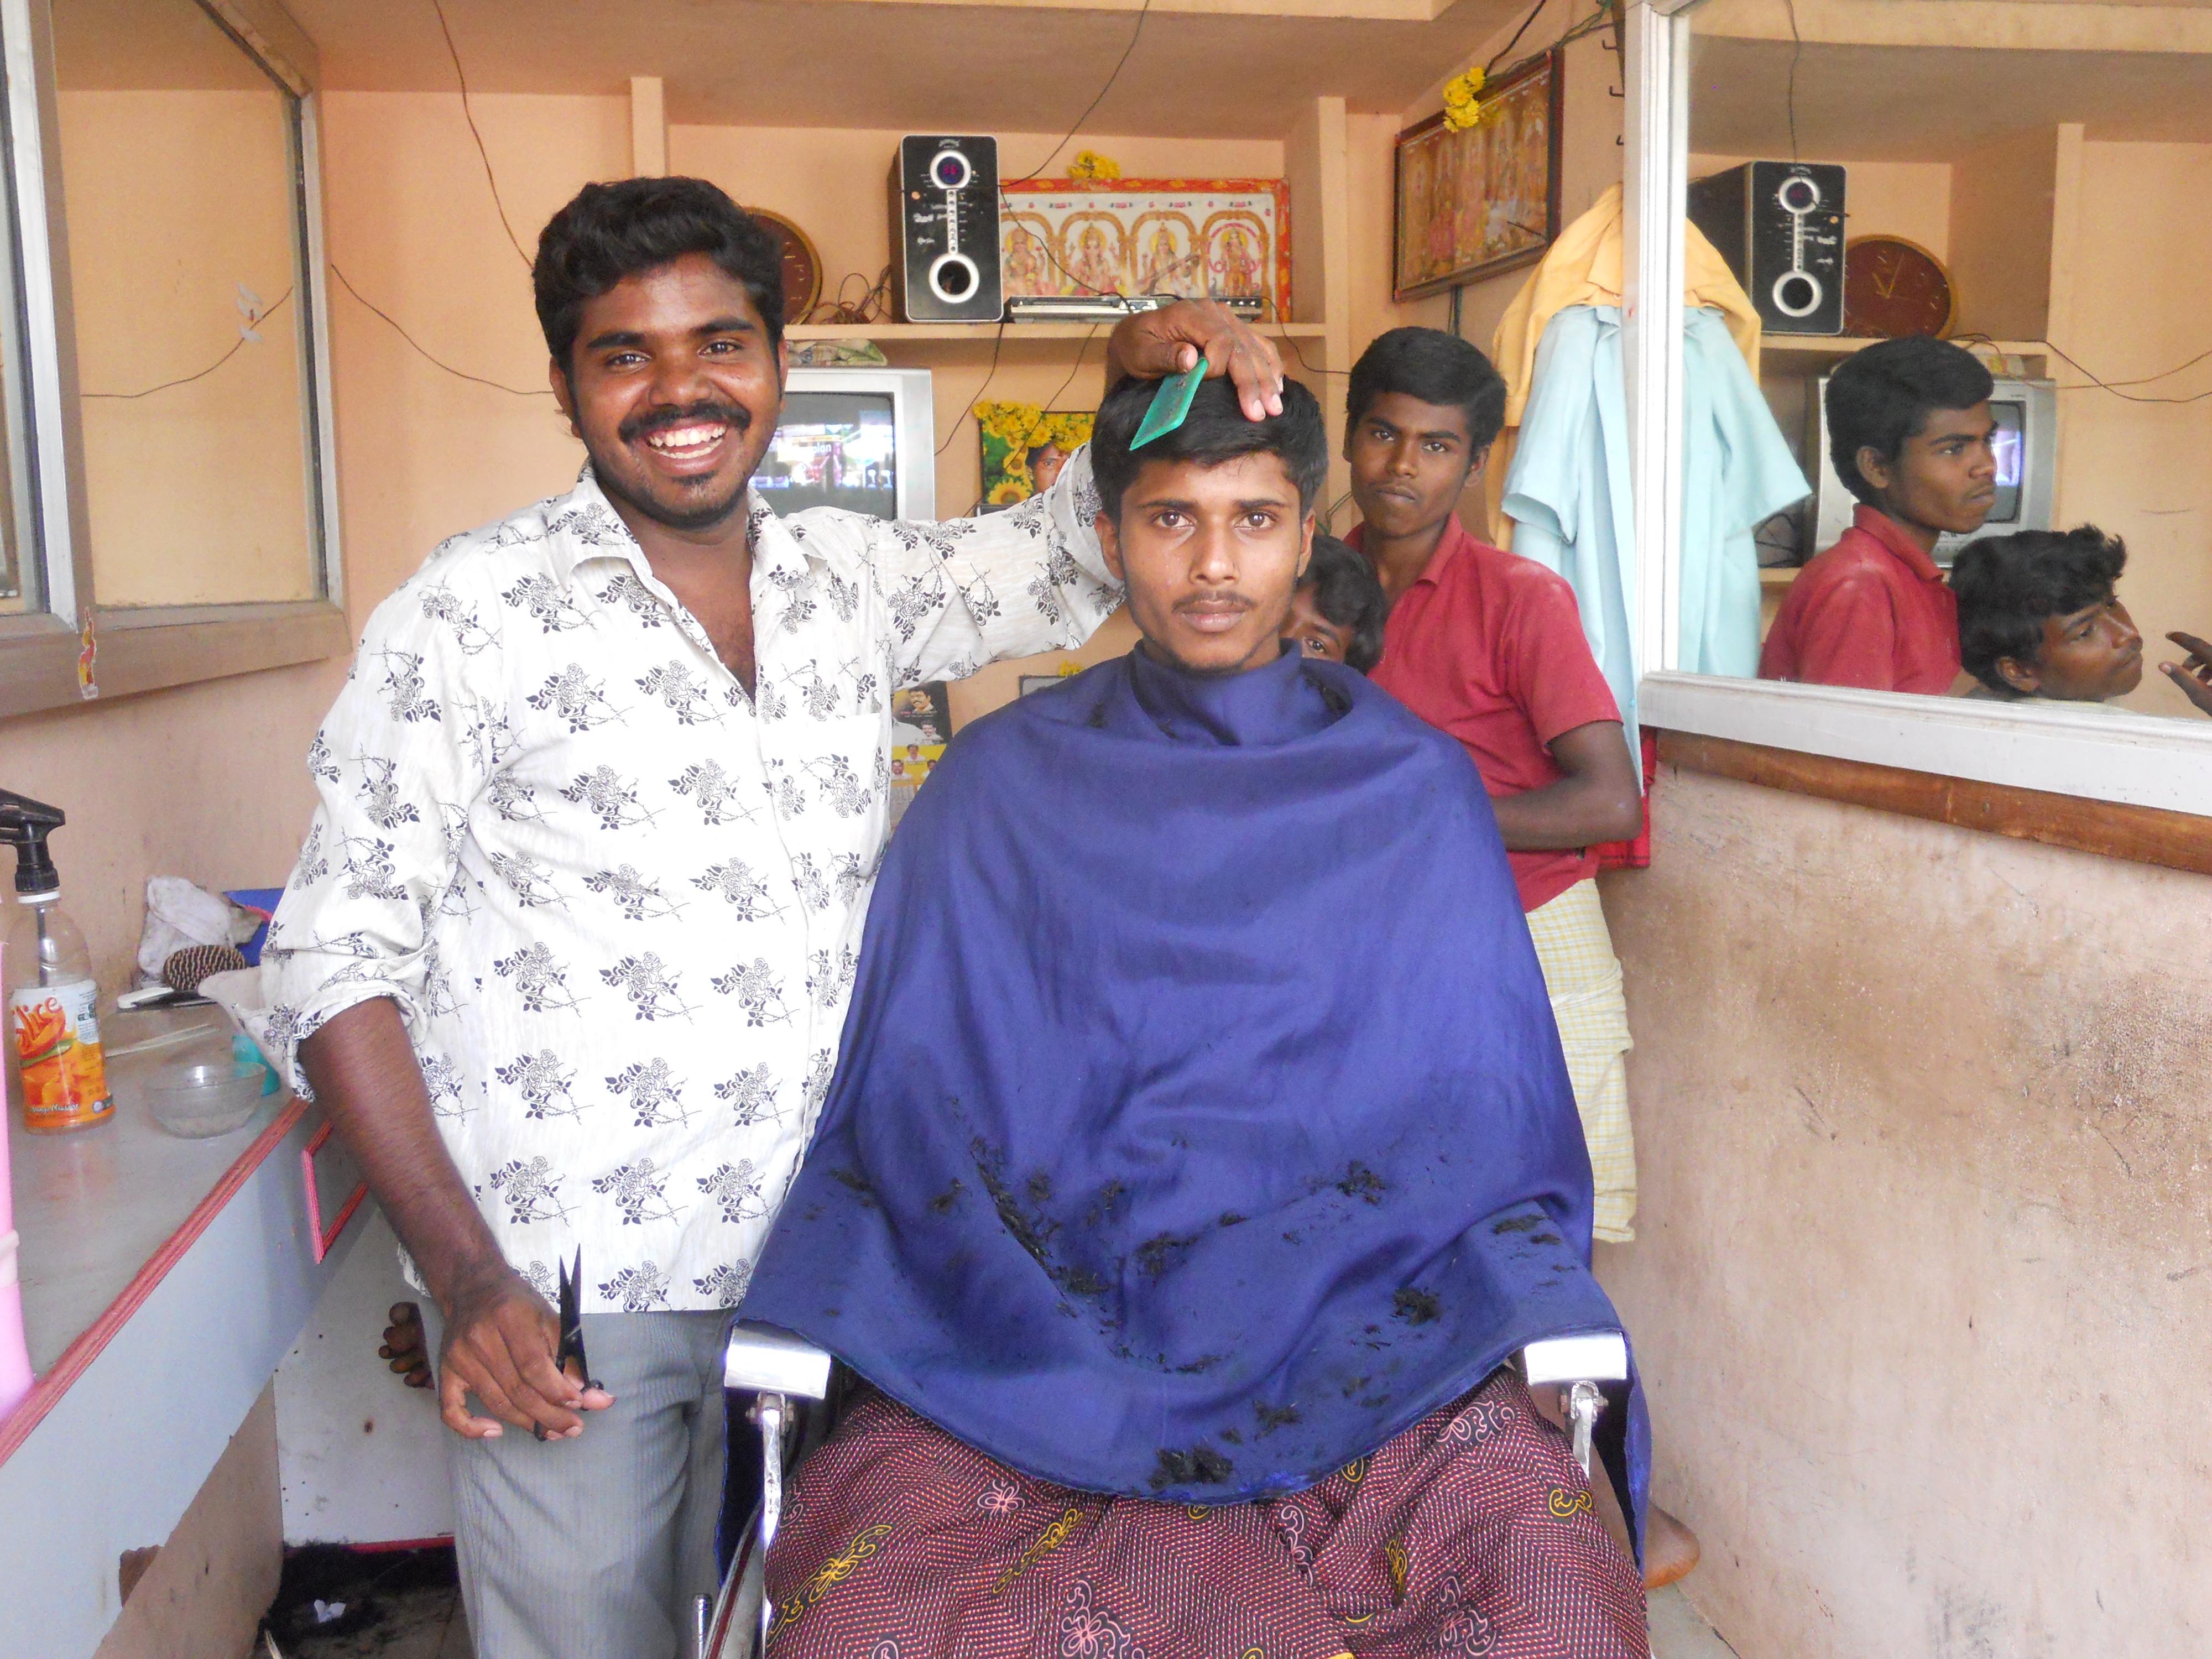 File:Barber shop.jpeg - Wikimedia Commons